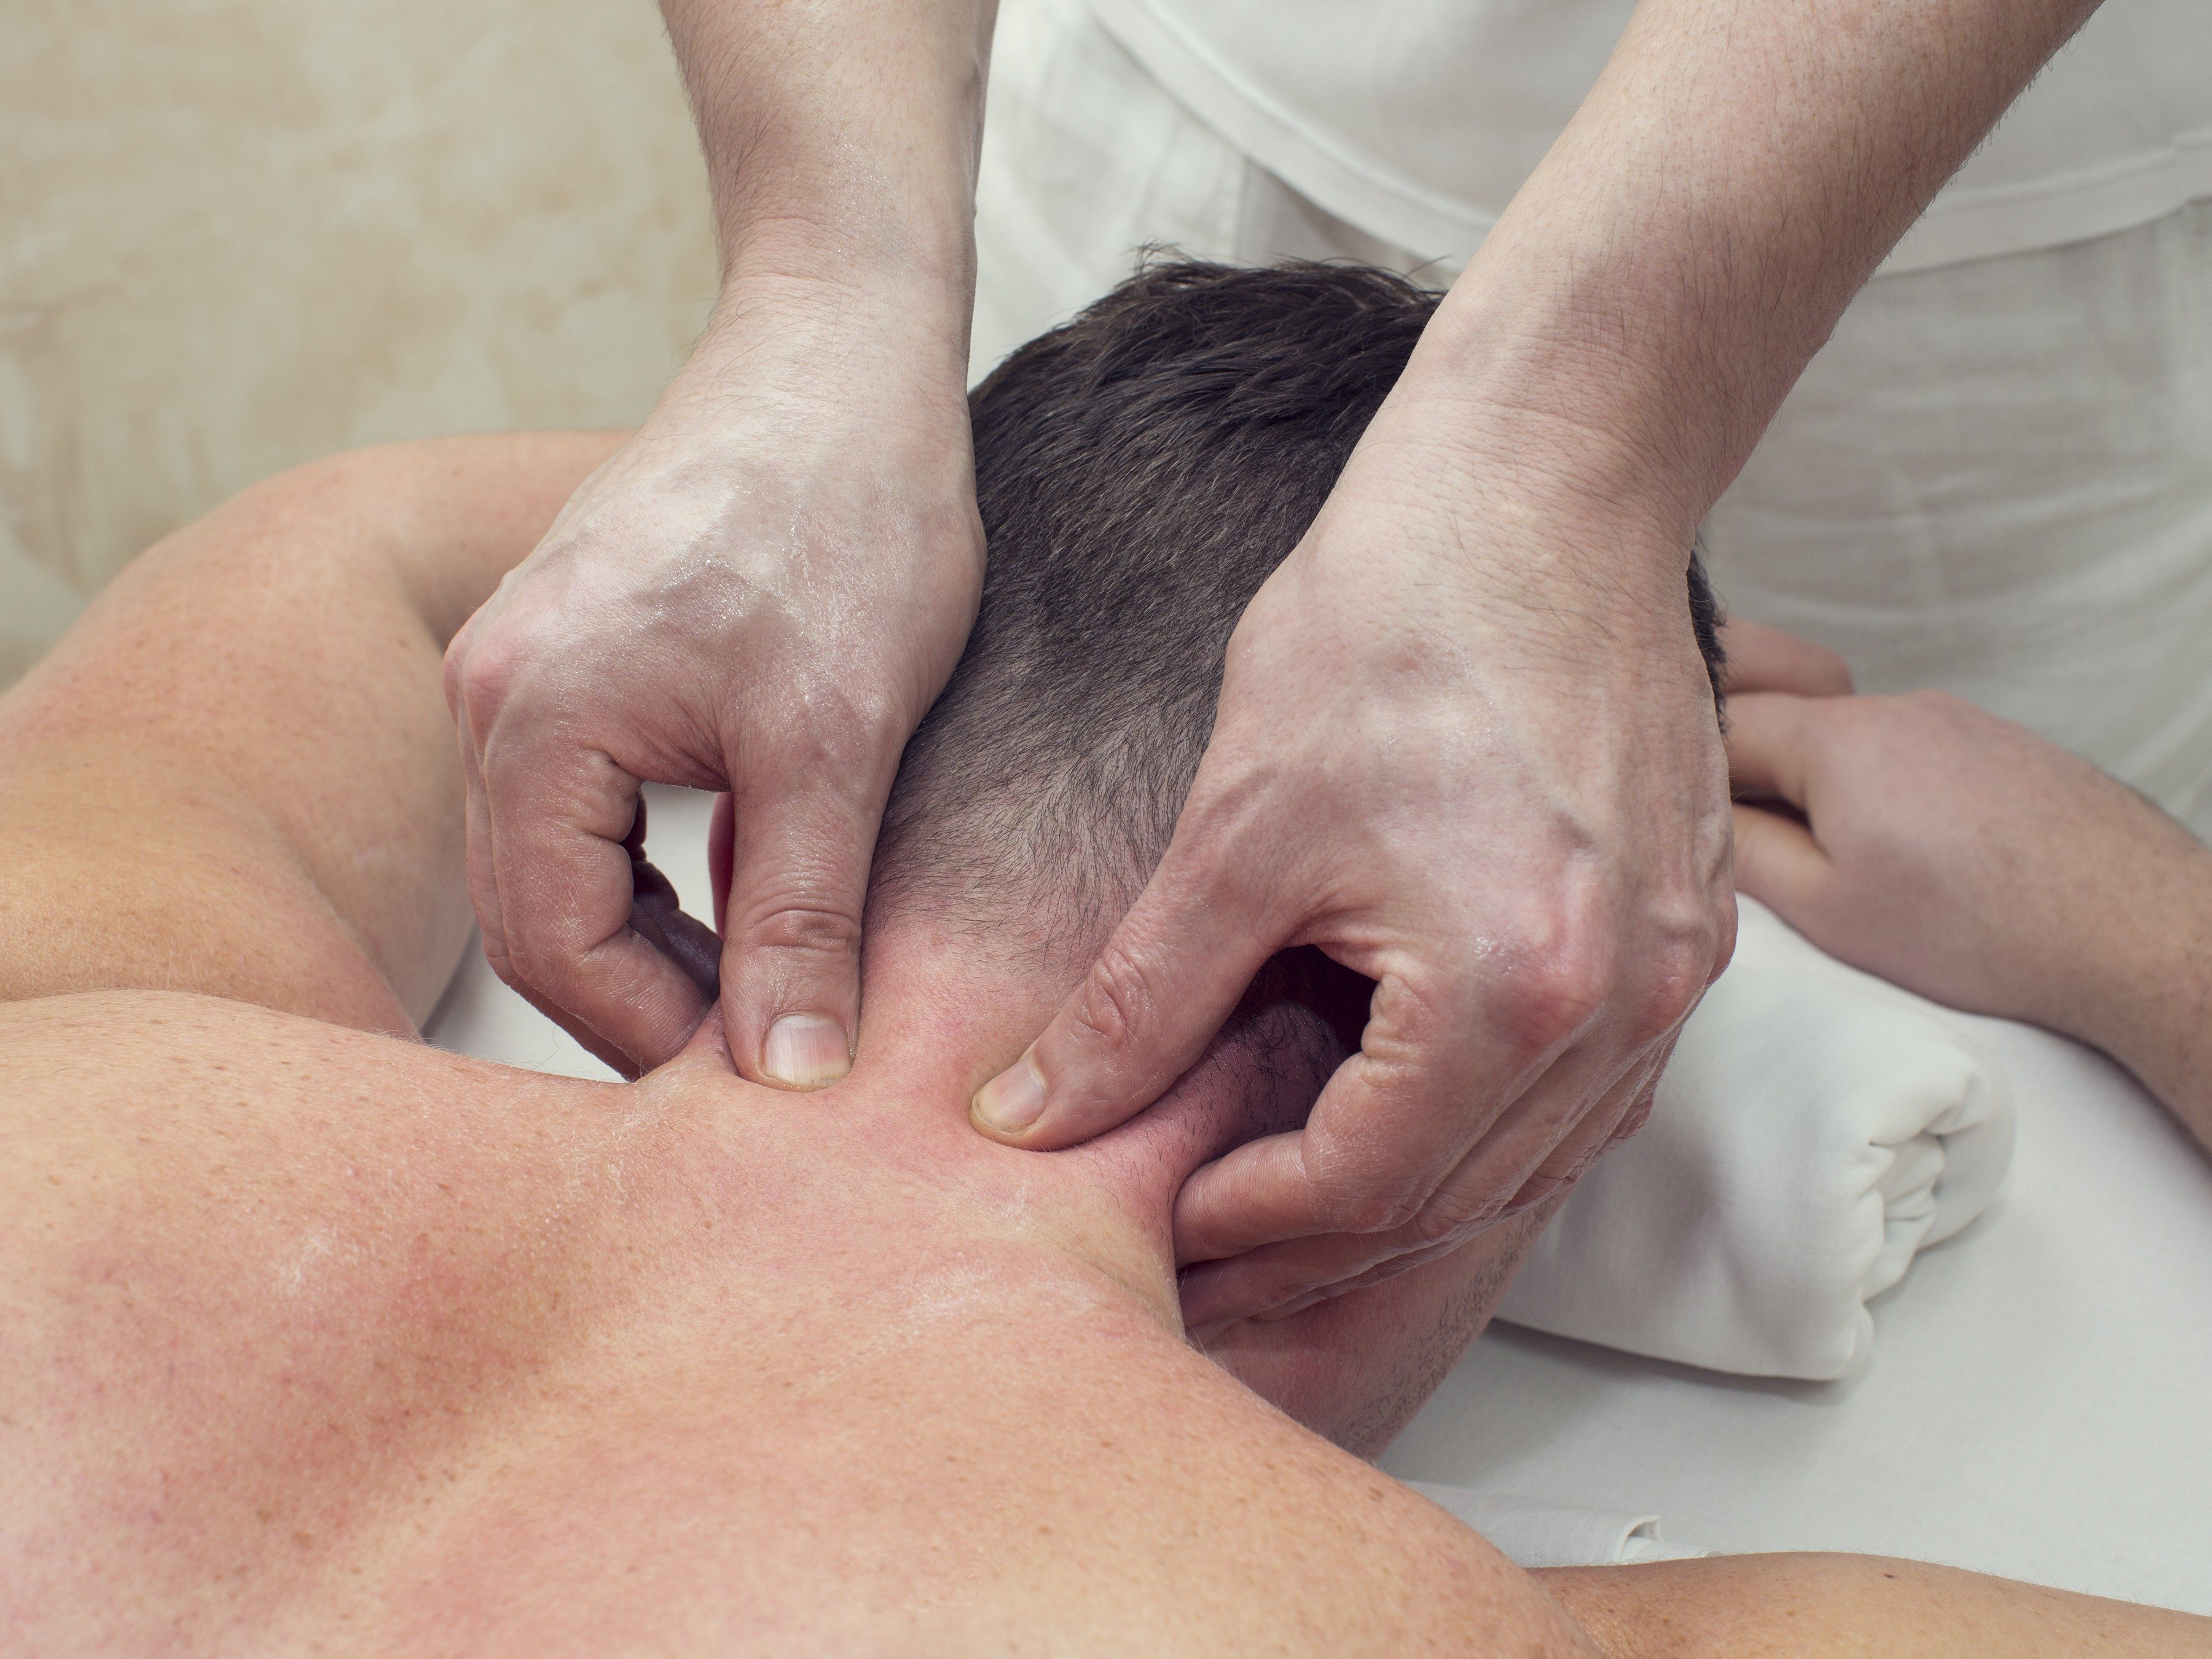 6. Massage therapy